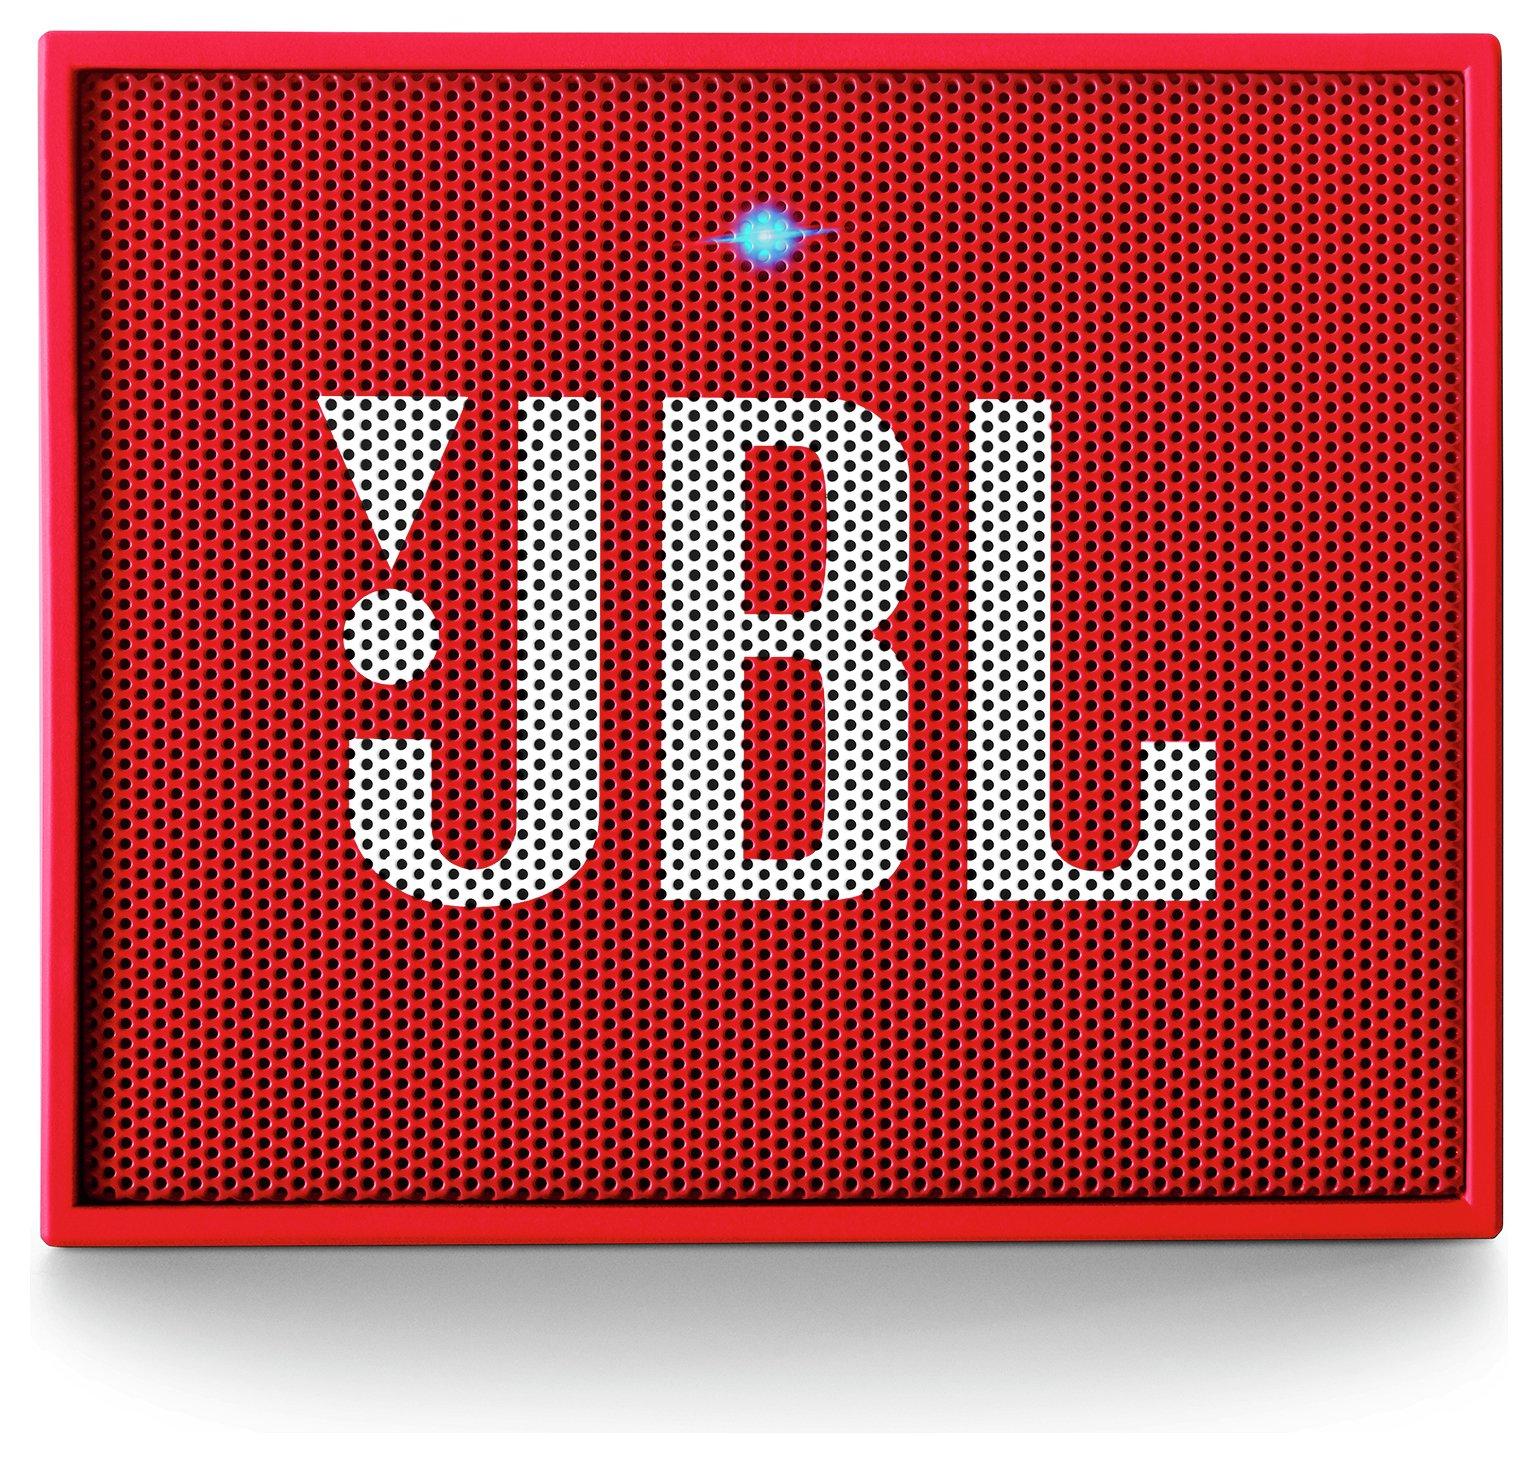 JBL JBL GO Portable Bluetooth Speaker - Red.